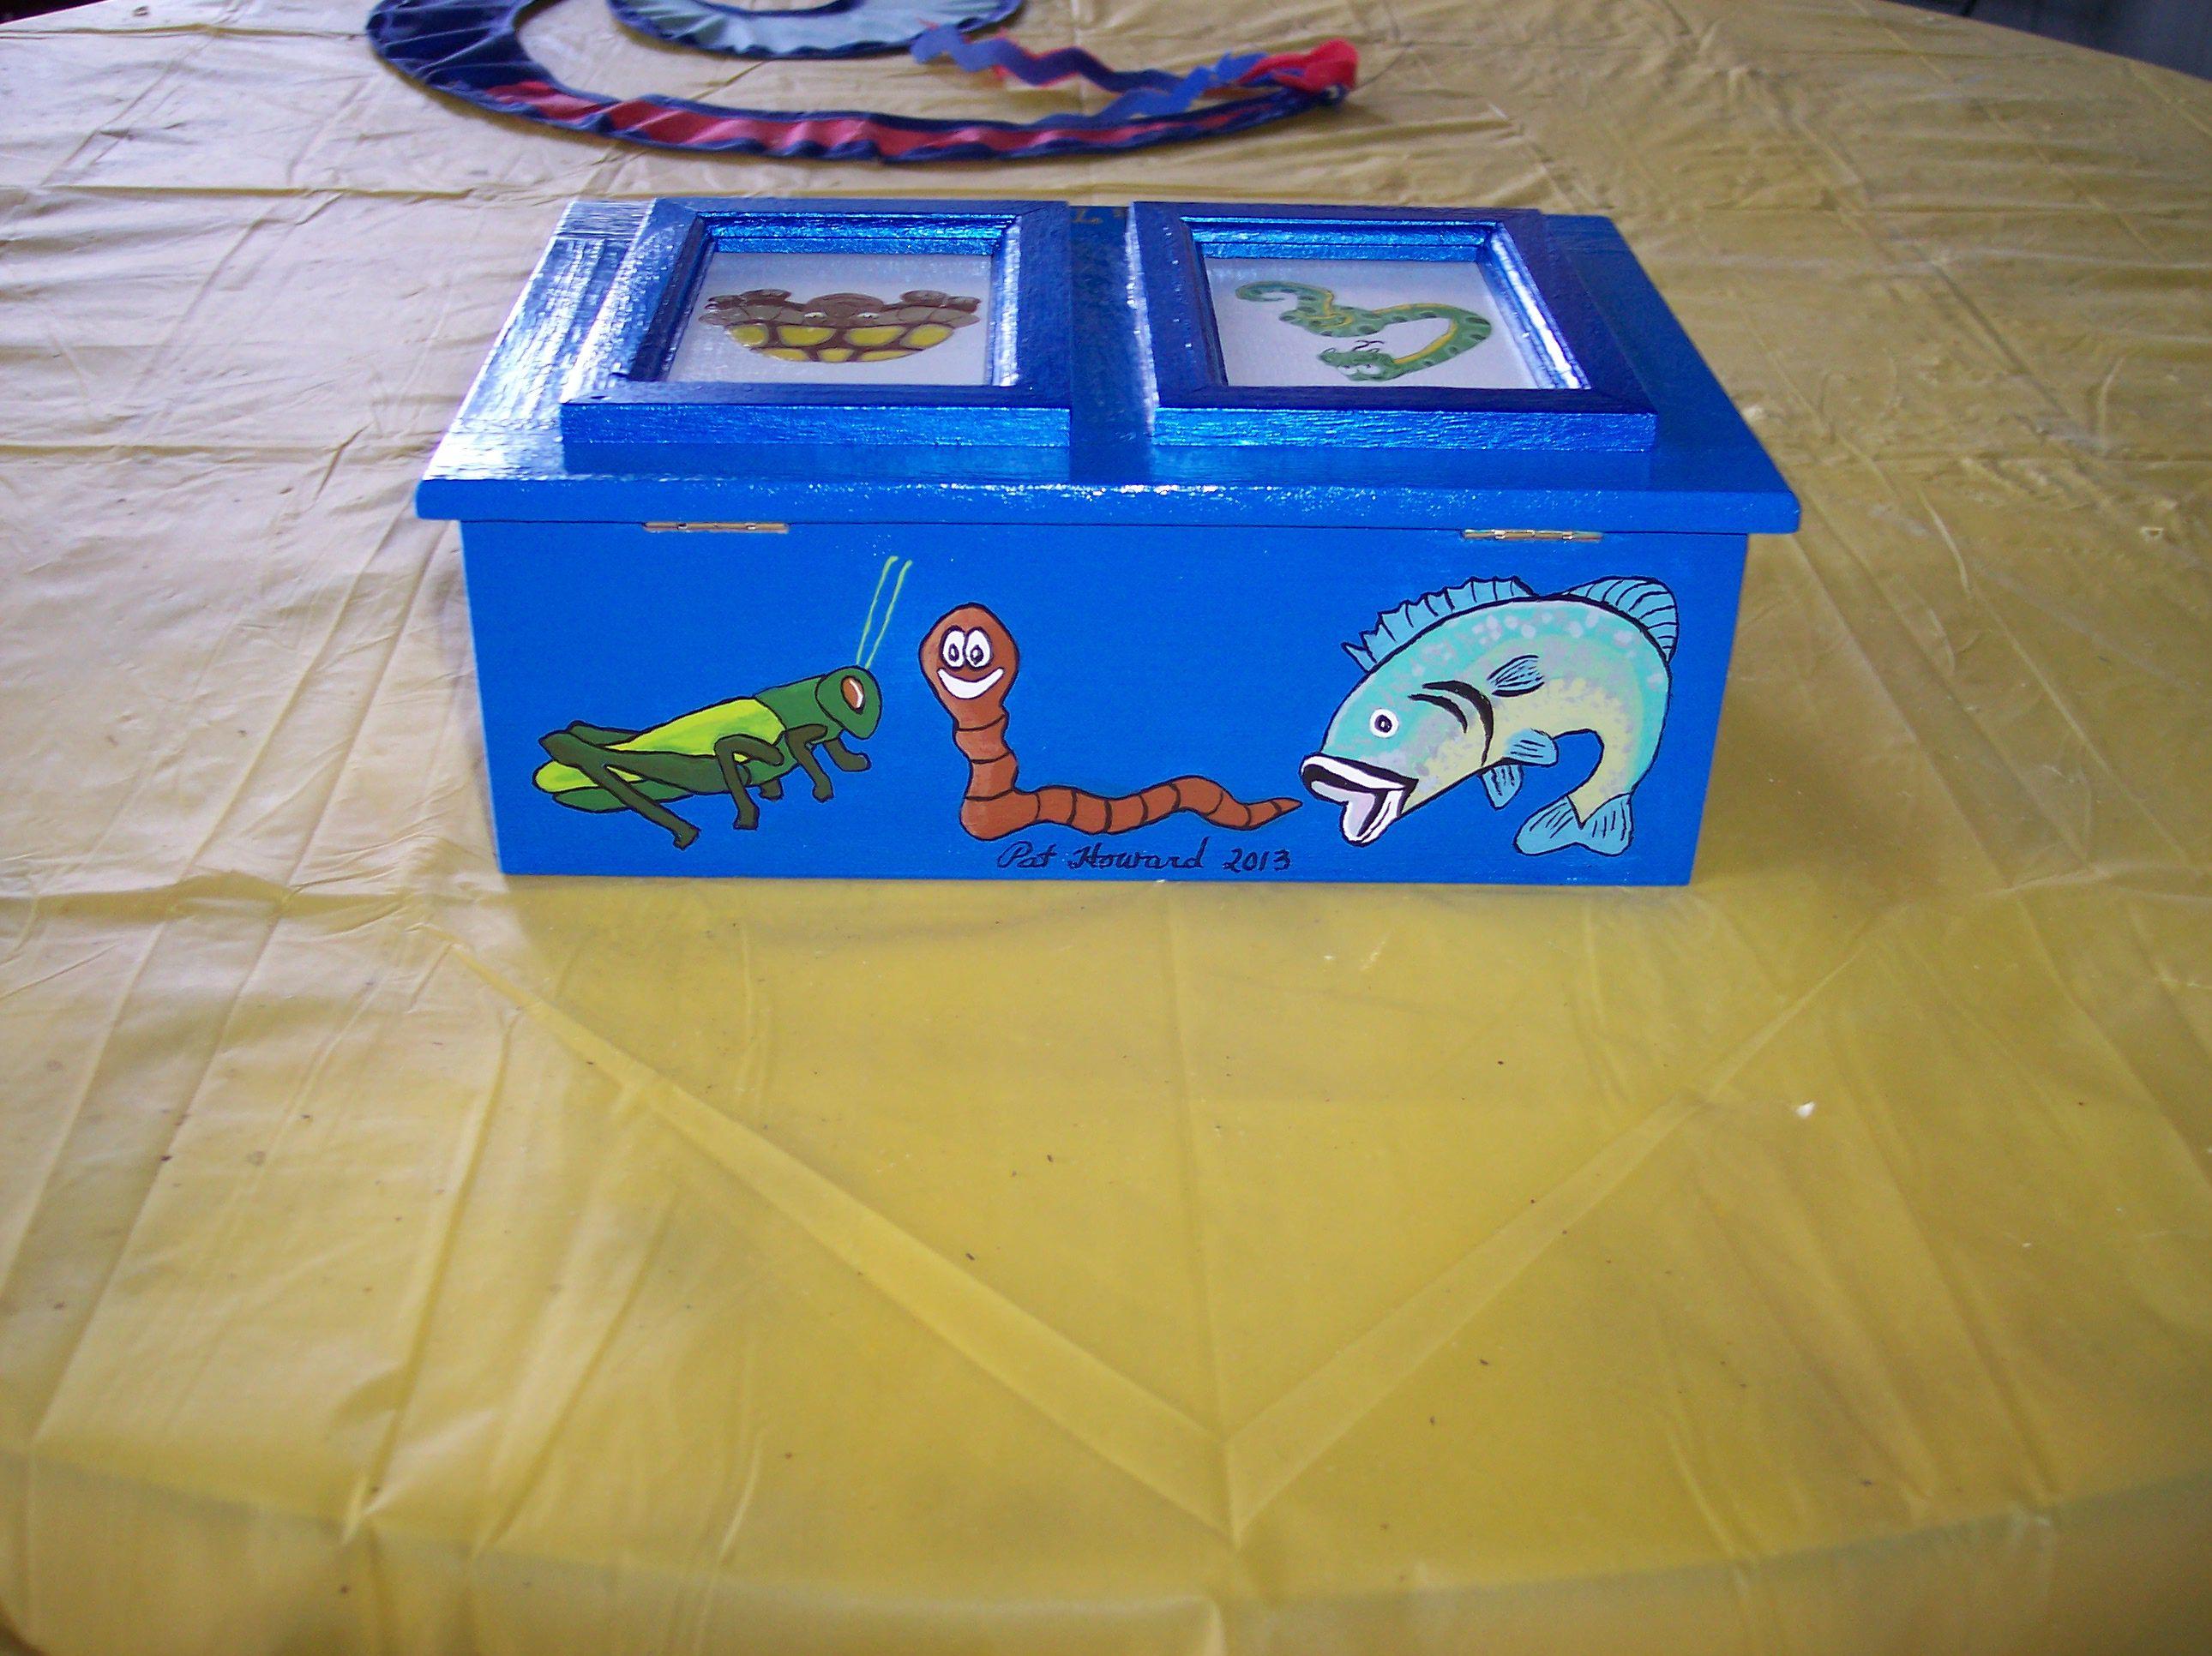 Back panel of treasure box